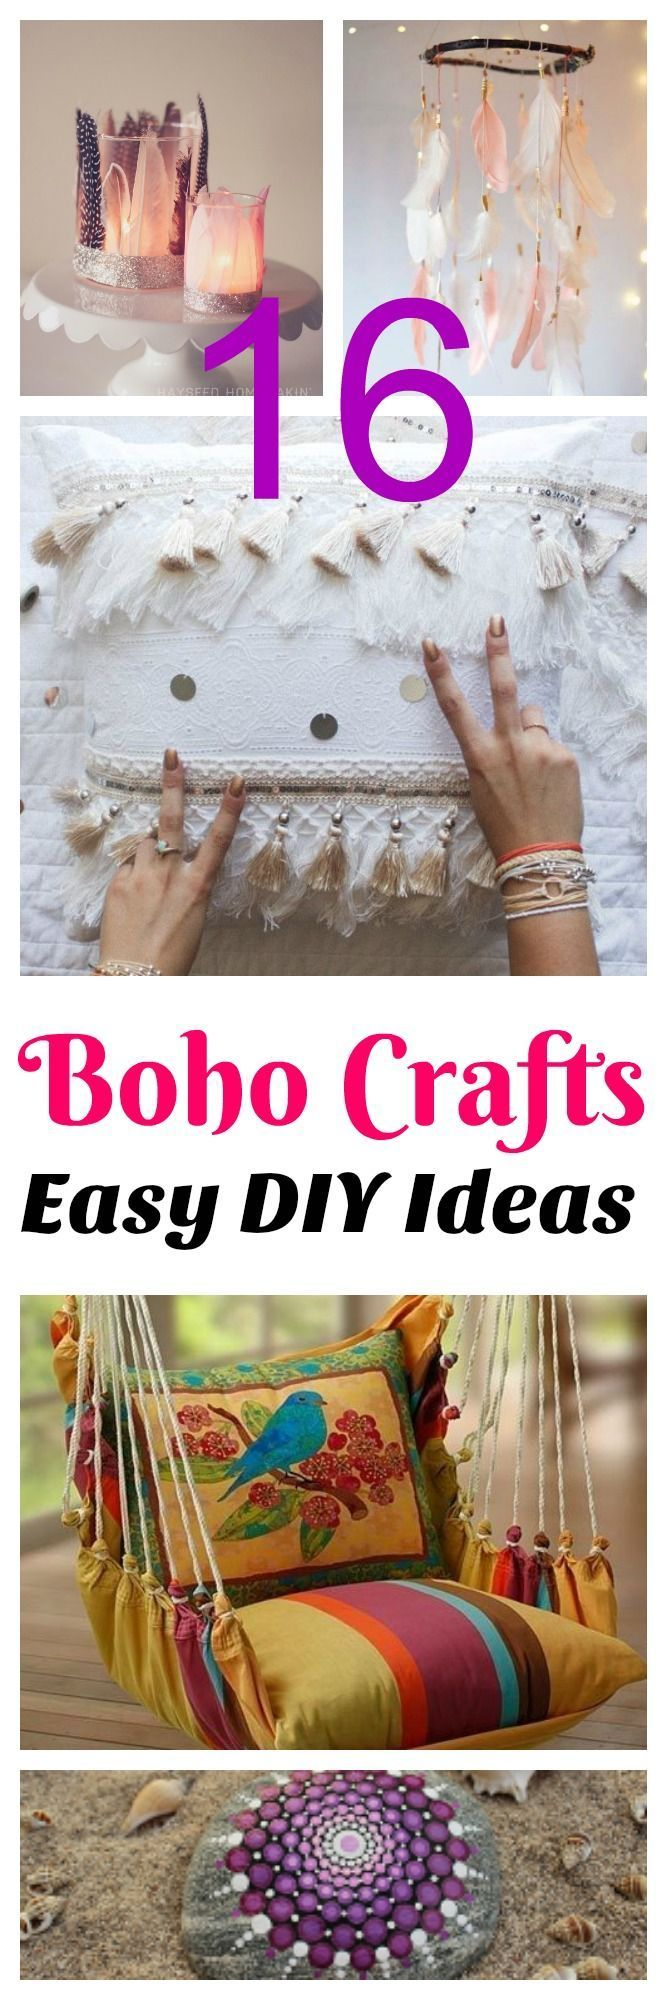 3 Easy Diy Storage Ideas For Small Kitchen: Best 25+ Boho Teen Bedroom Ideas On Pinterest